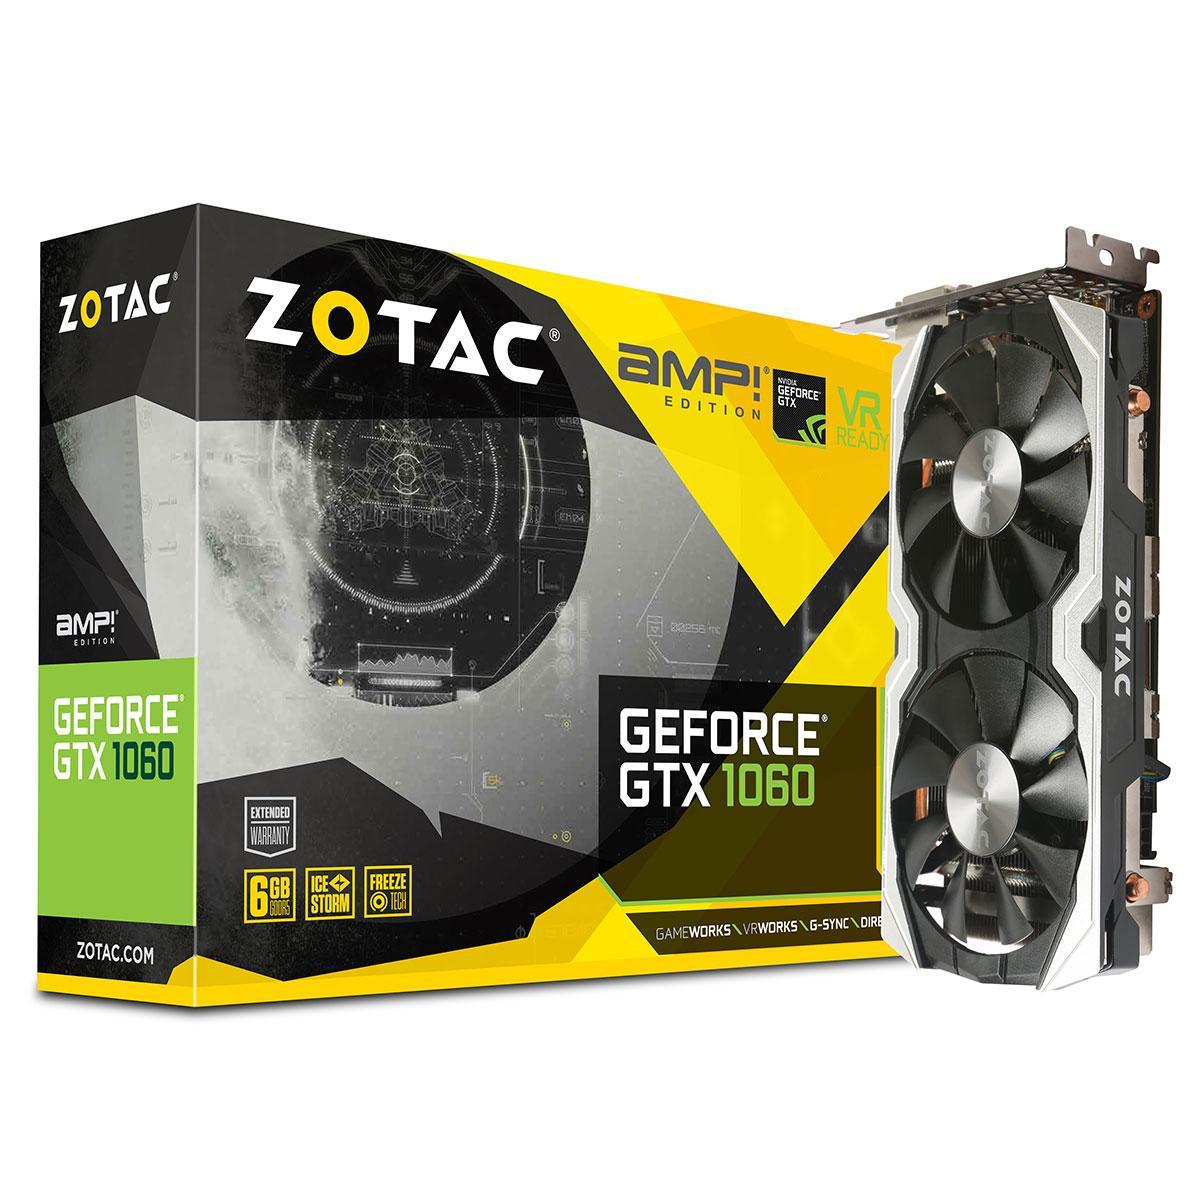 Carte graphique Zotac GeForce GTX 1060 AMP! Edition - 6 Go DDR5 + Rocket League offert